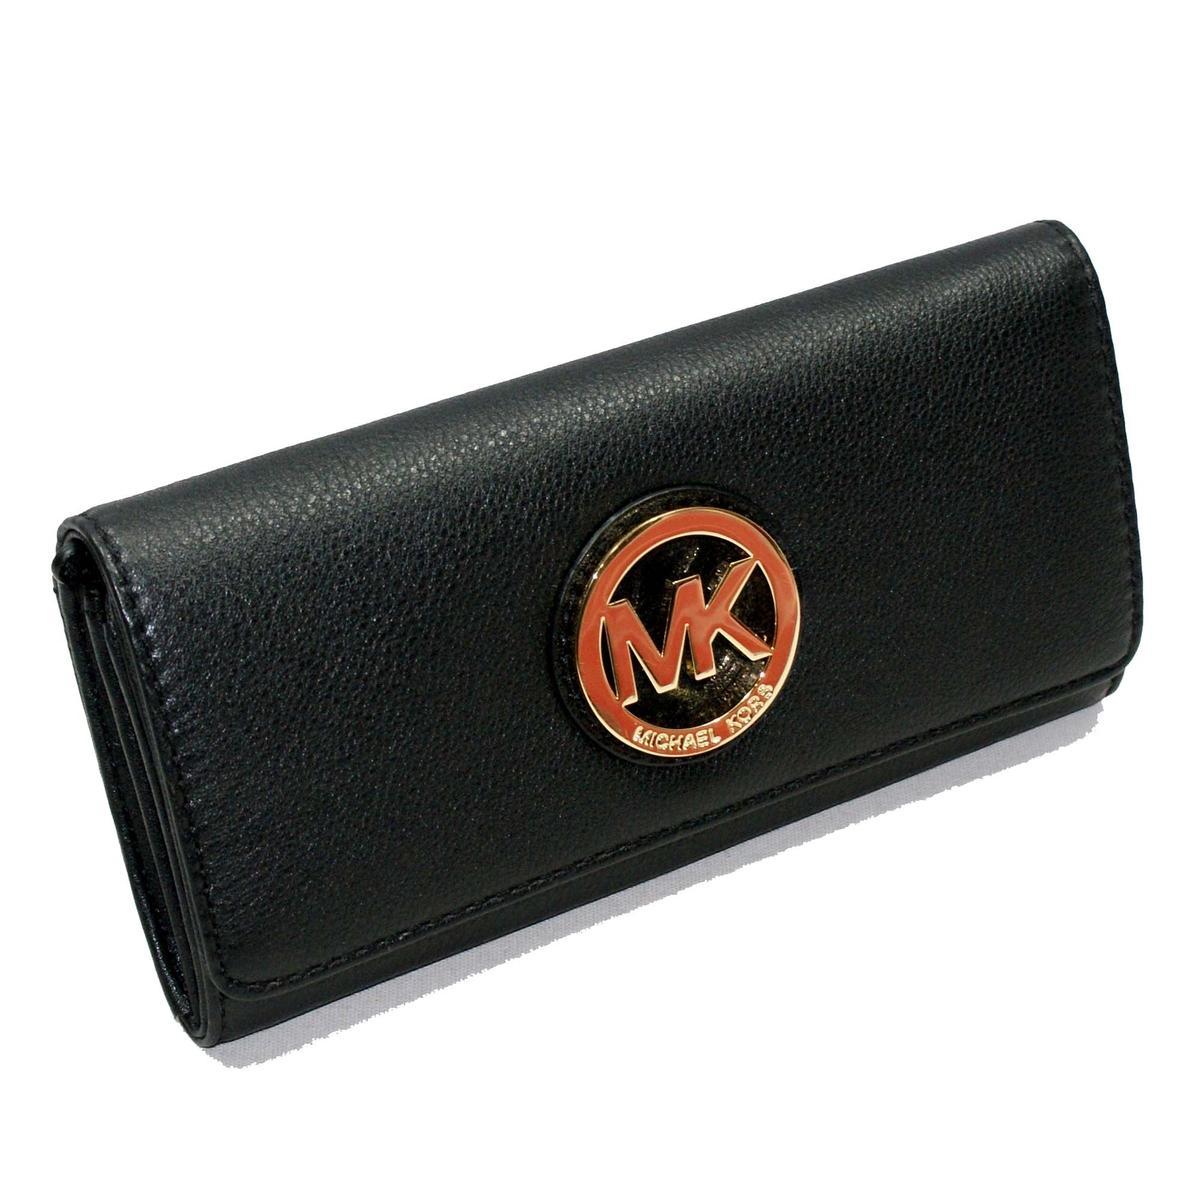 Michael Kors Fulton Flap Contiental Genuine Leather Black